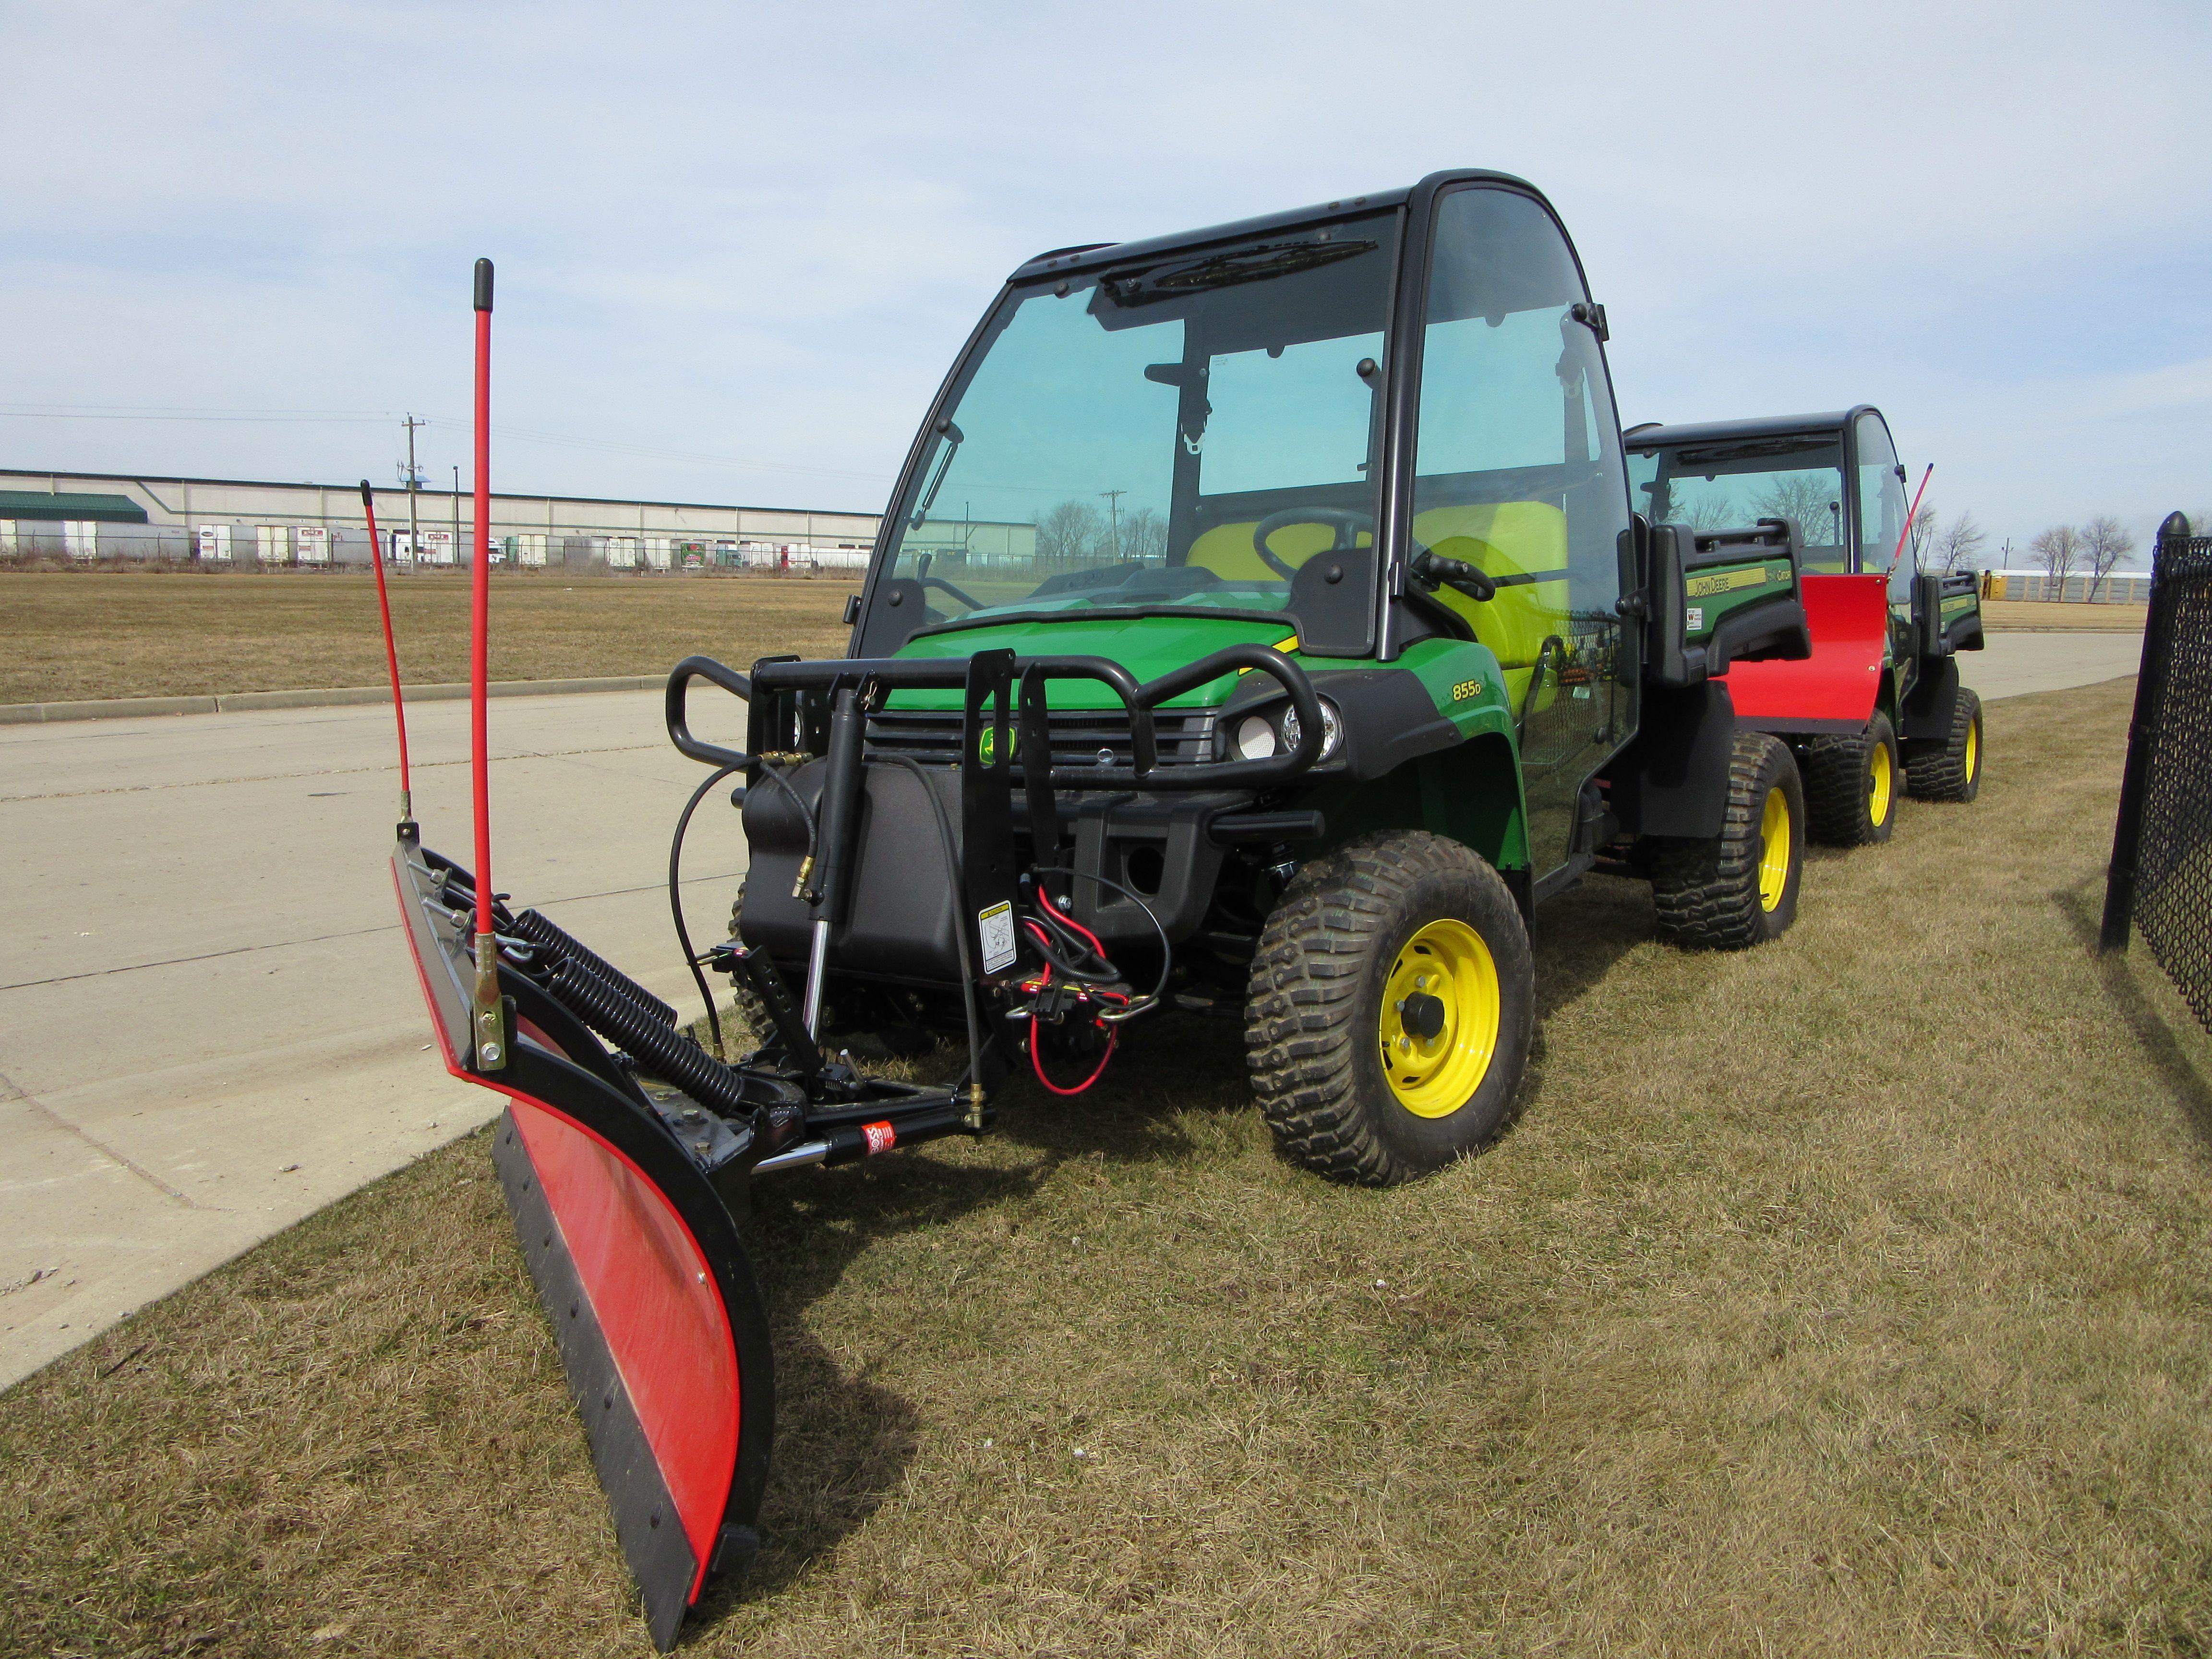 John Deere Gator Plow >> John Deere Gator 855D with red Boss plow | John Deere equipment | Pinterest | John deere, Boss ...